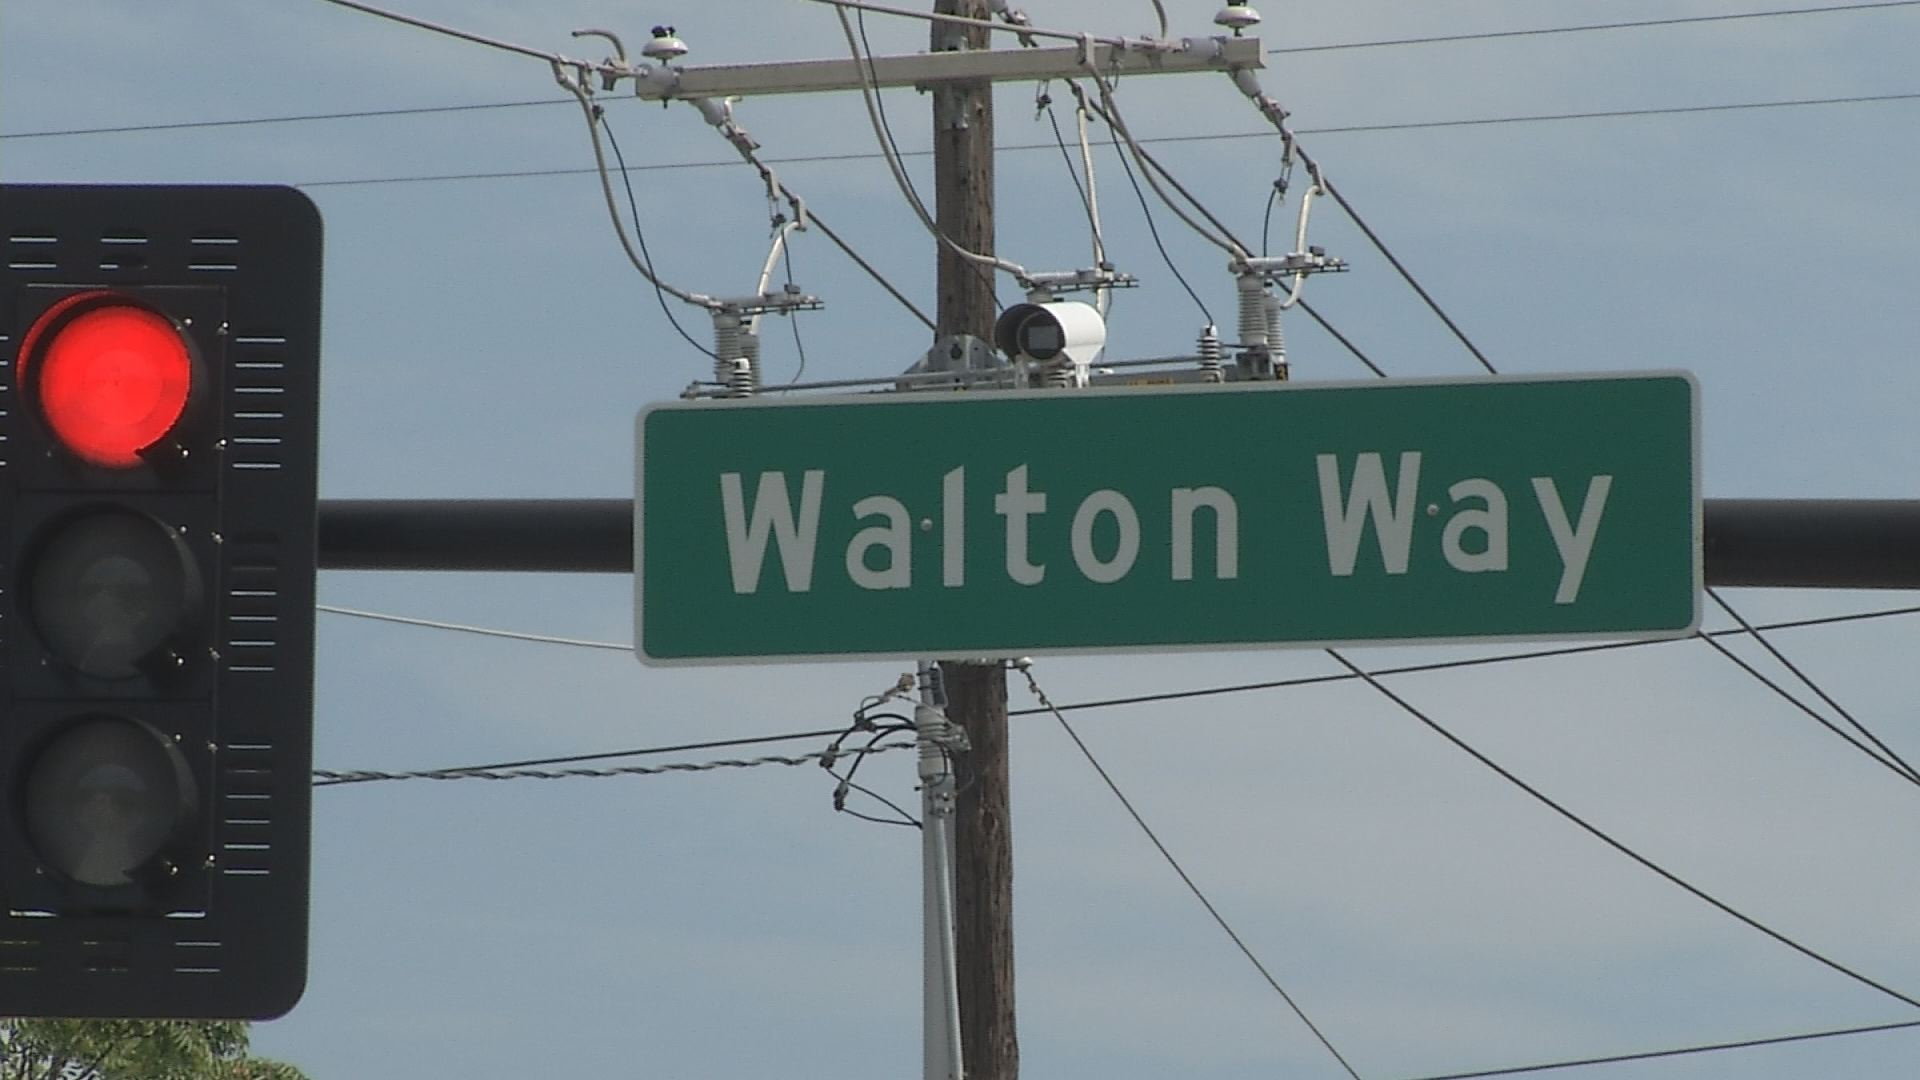 walton way clean up_1532383149185.jpg.jpg